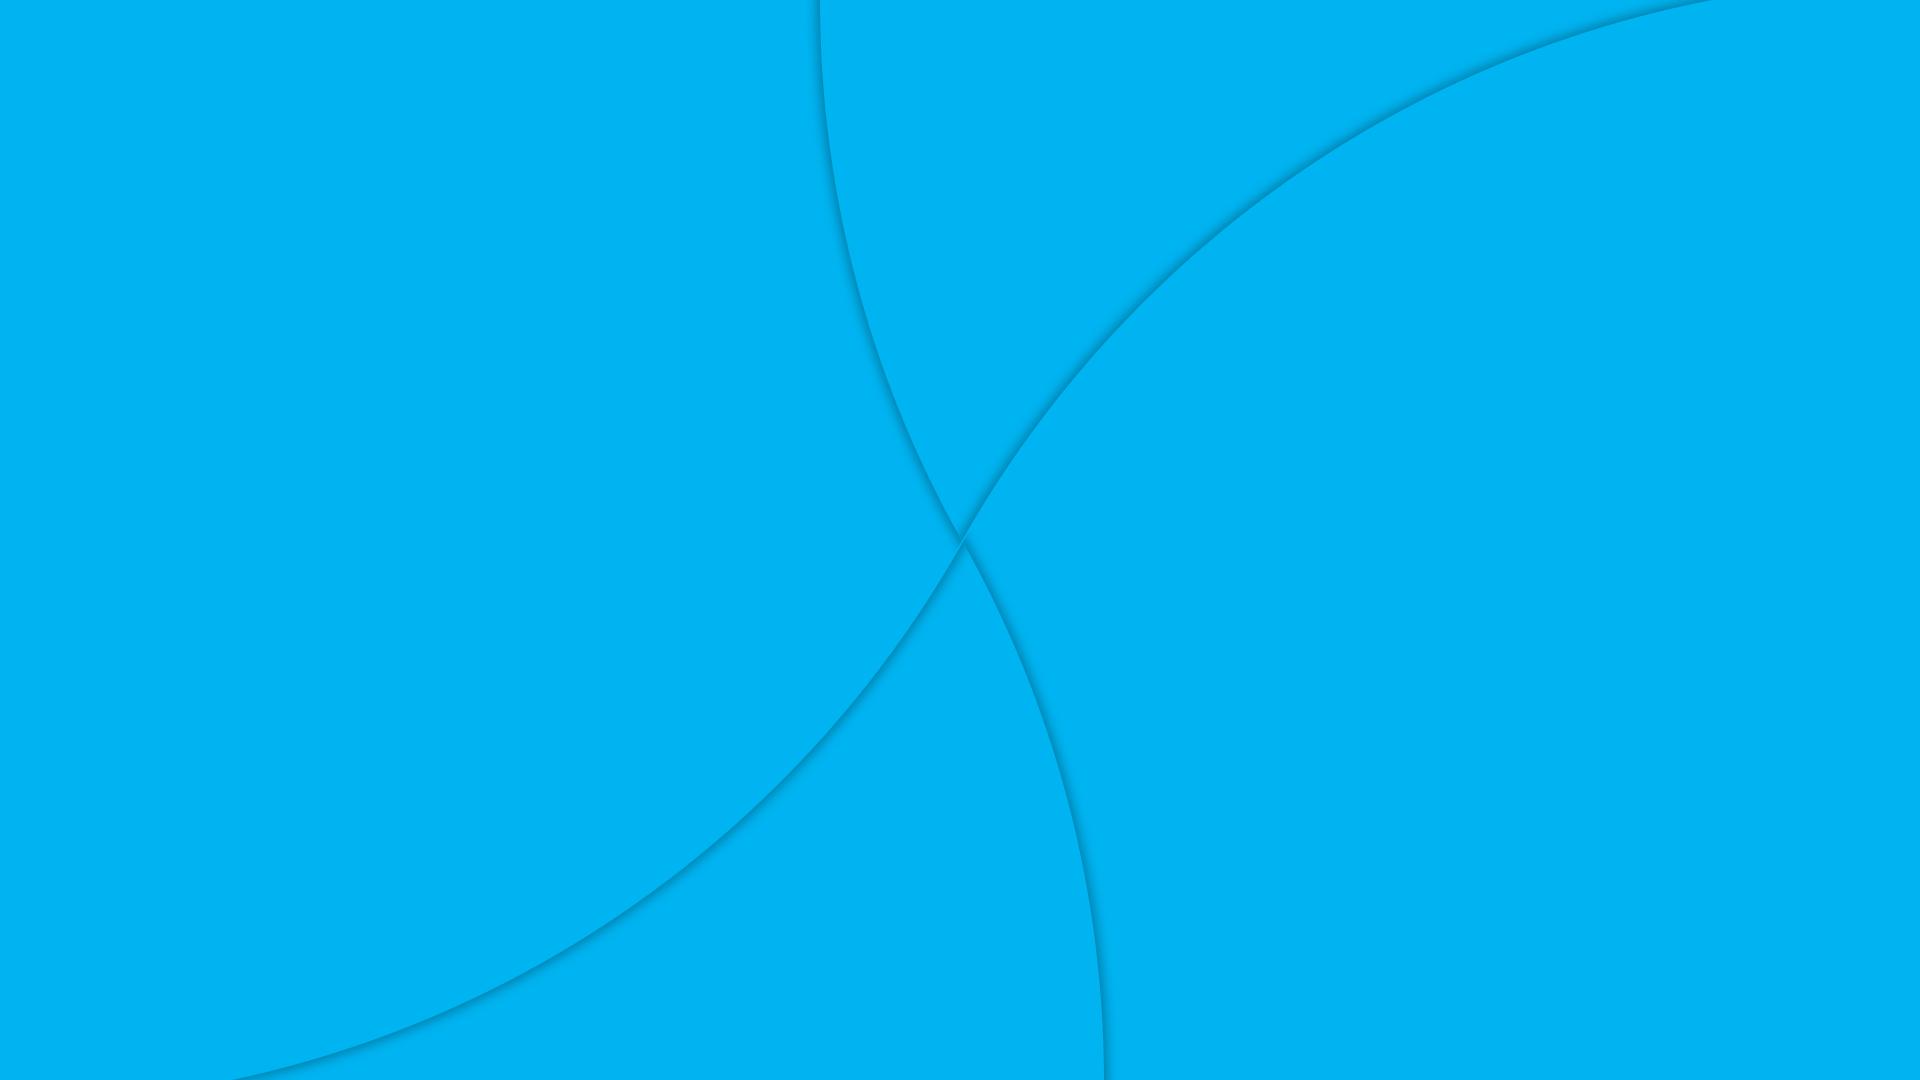 Wallpaper : blue, circle, Microsoft Windows, windows10, wave